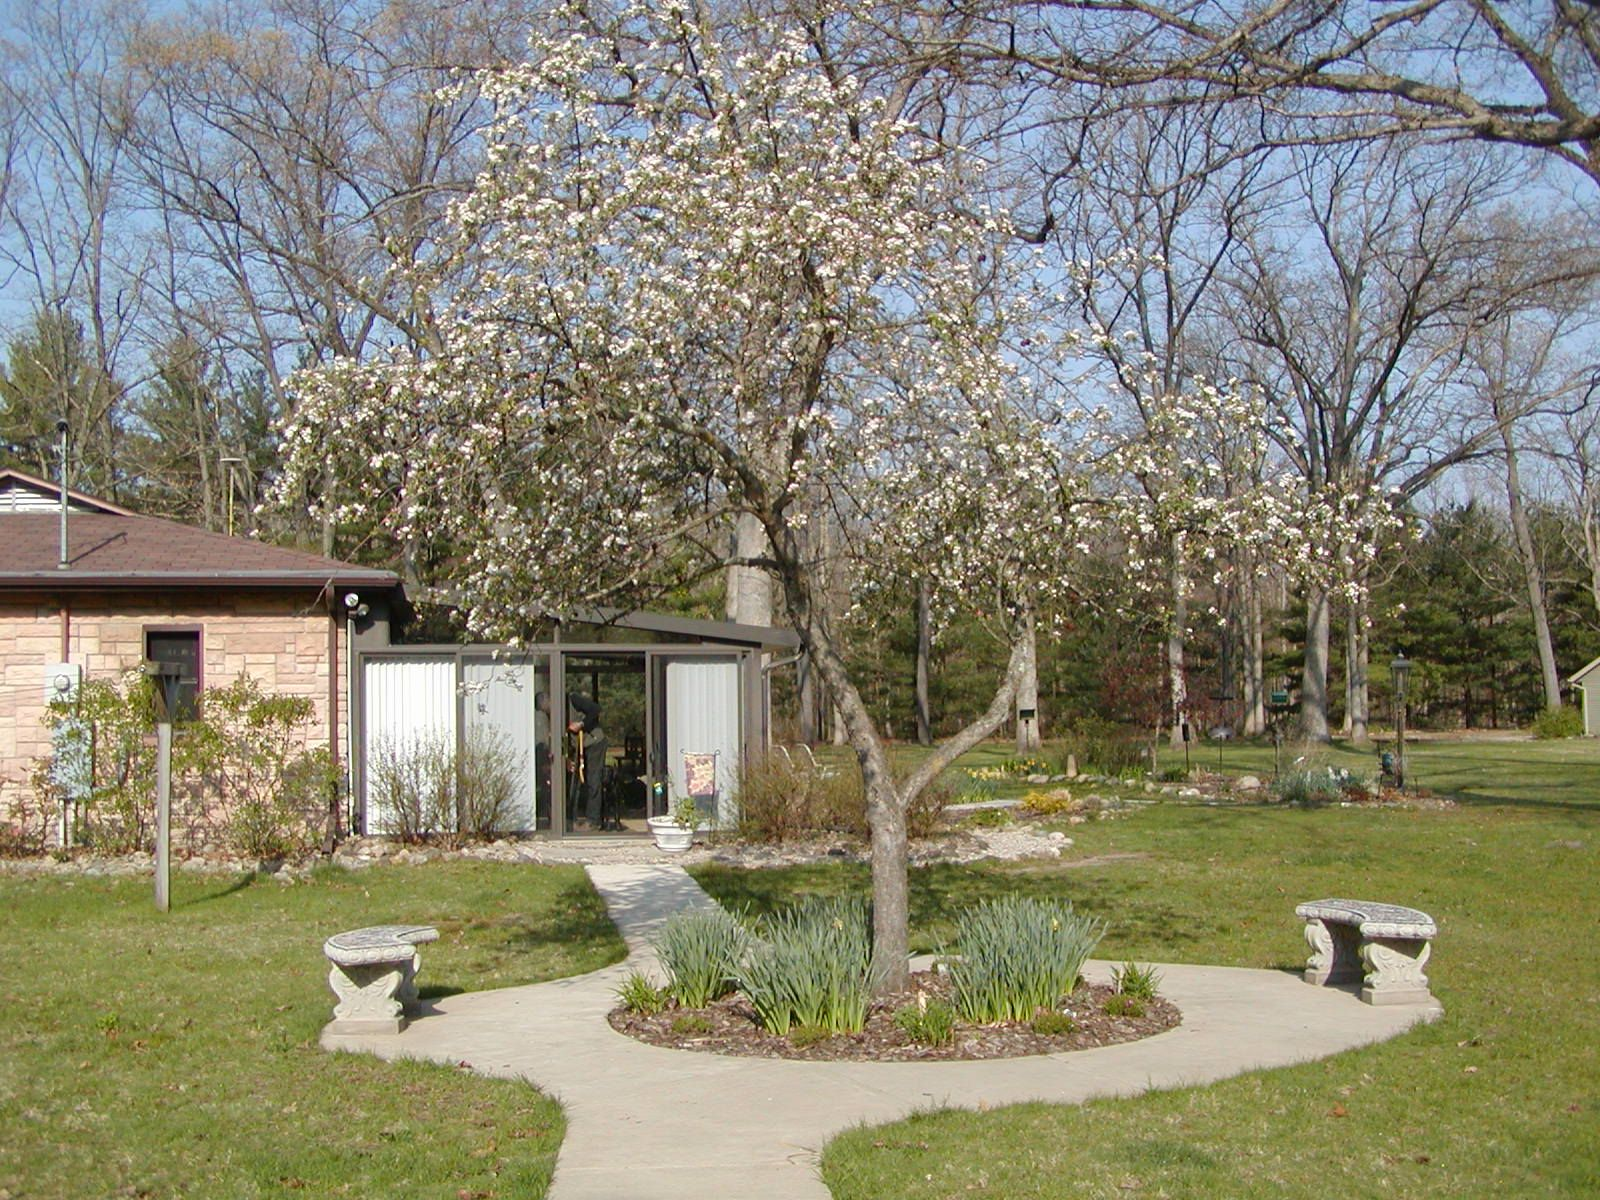 apple tree meditation garden - Google Search